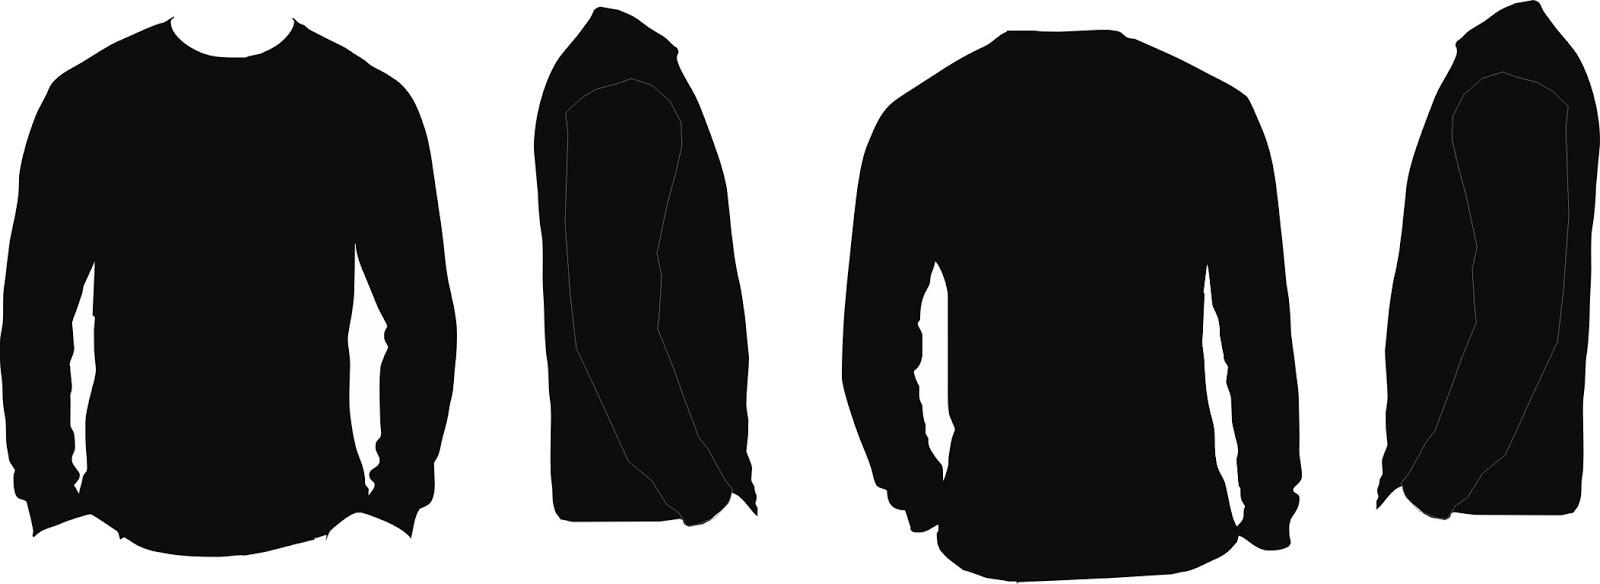 55 Koleksi Gambar Desain Kaos Polo Lengan Panjang Cdr Gratis Terbaru Unduh Gratis